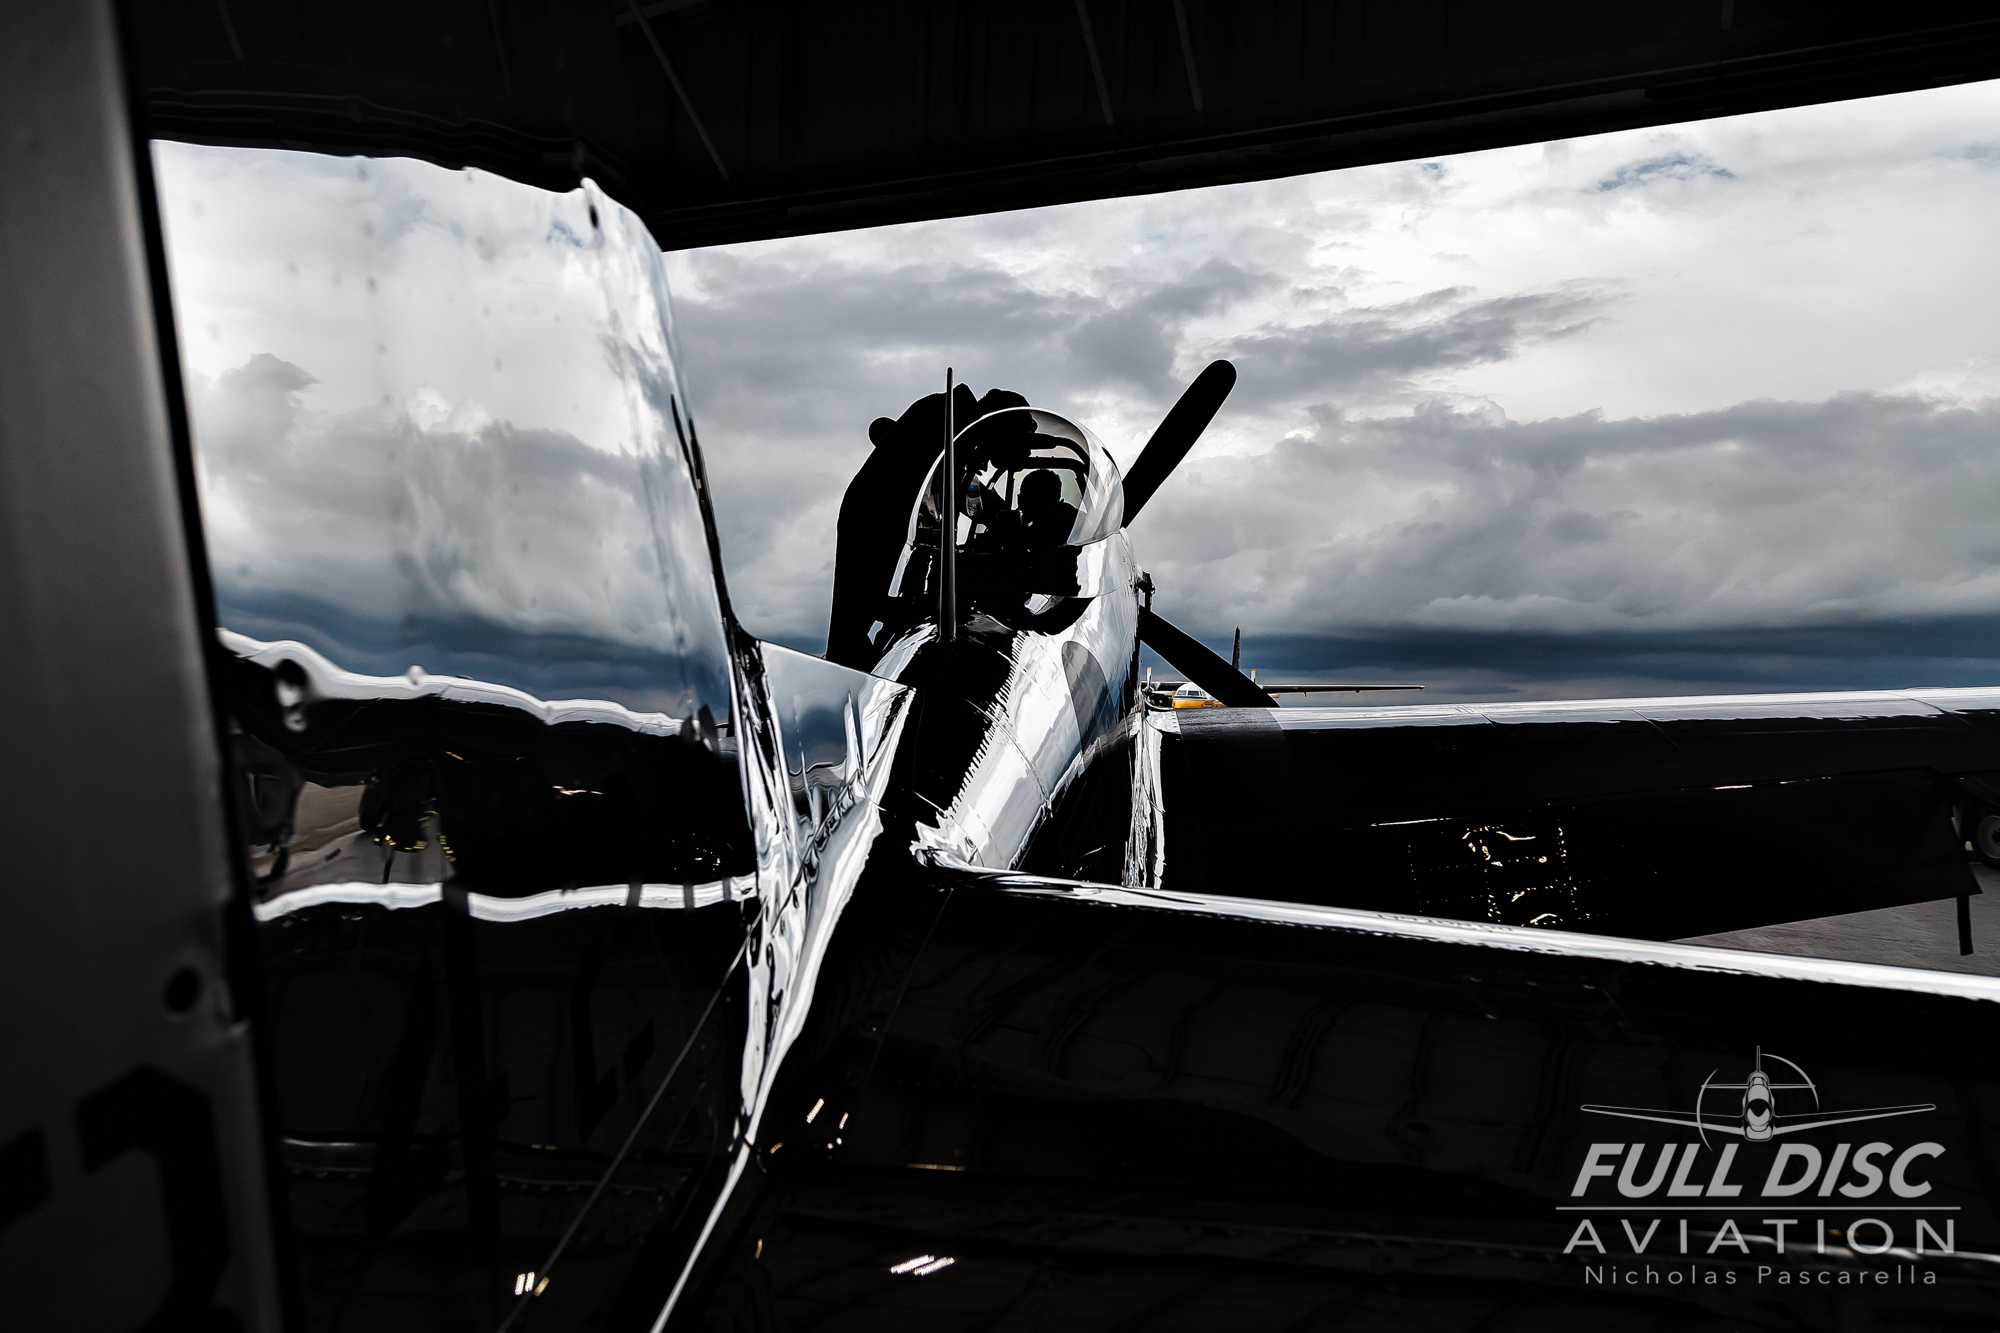 andrewmckenna_fulldiscaviation_nickpascarella_blackandwhite_hangar_moody.jpg